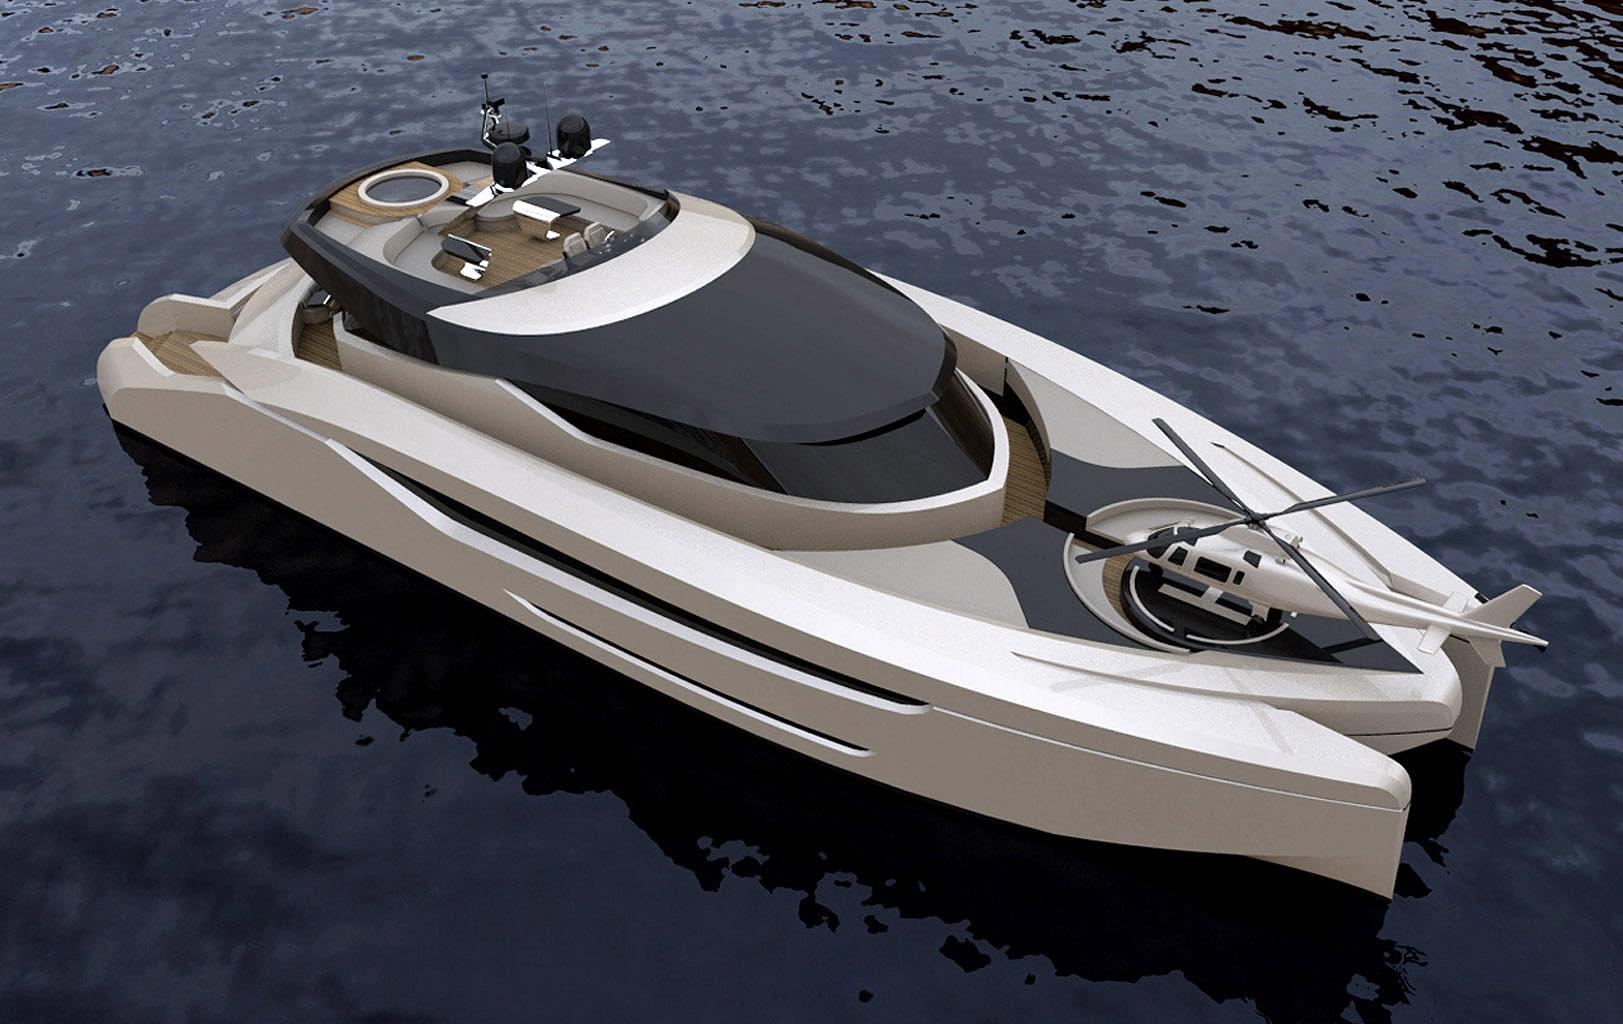 Power catamaran designs - Designindustria 130 Power Catamaran